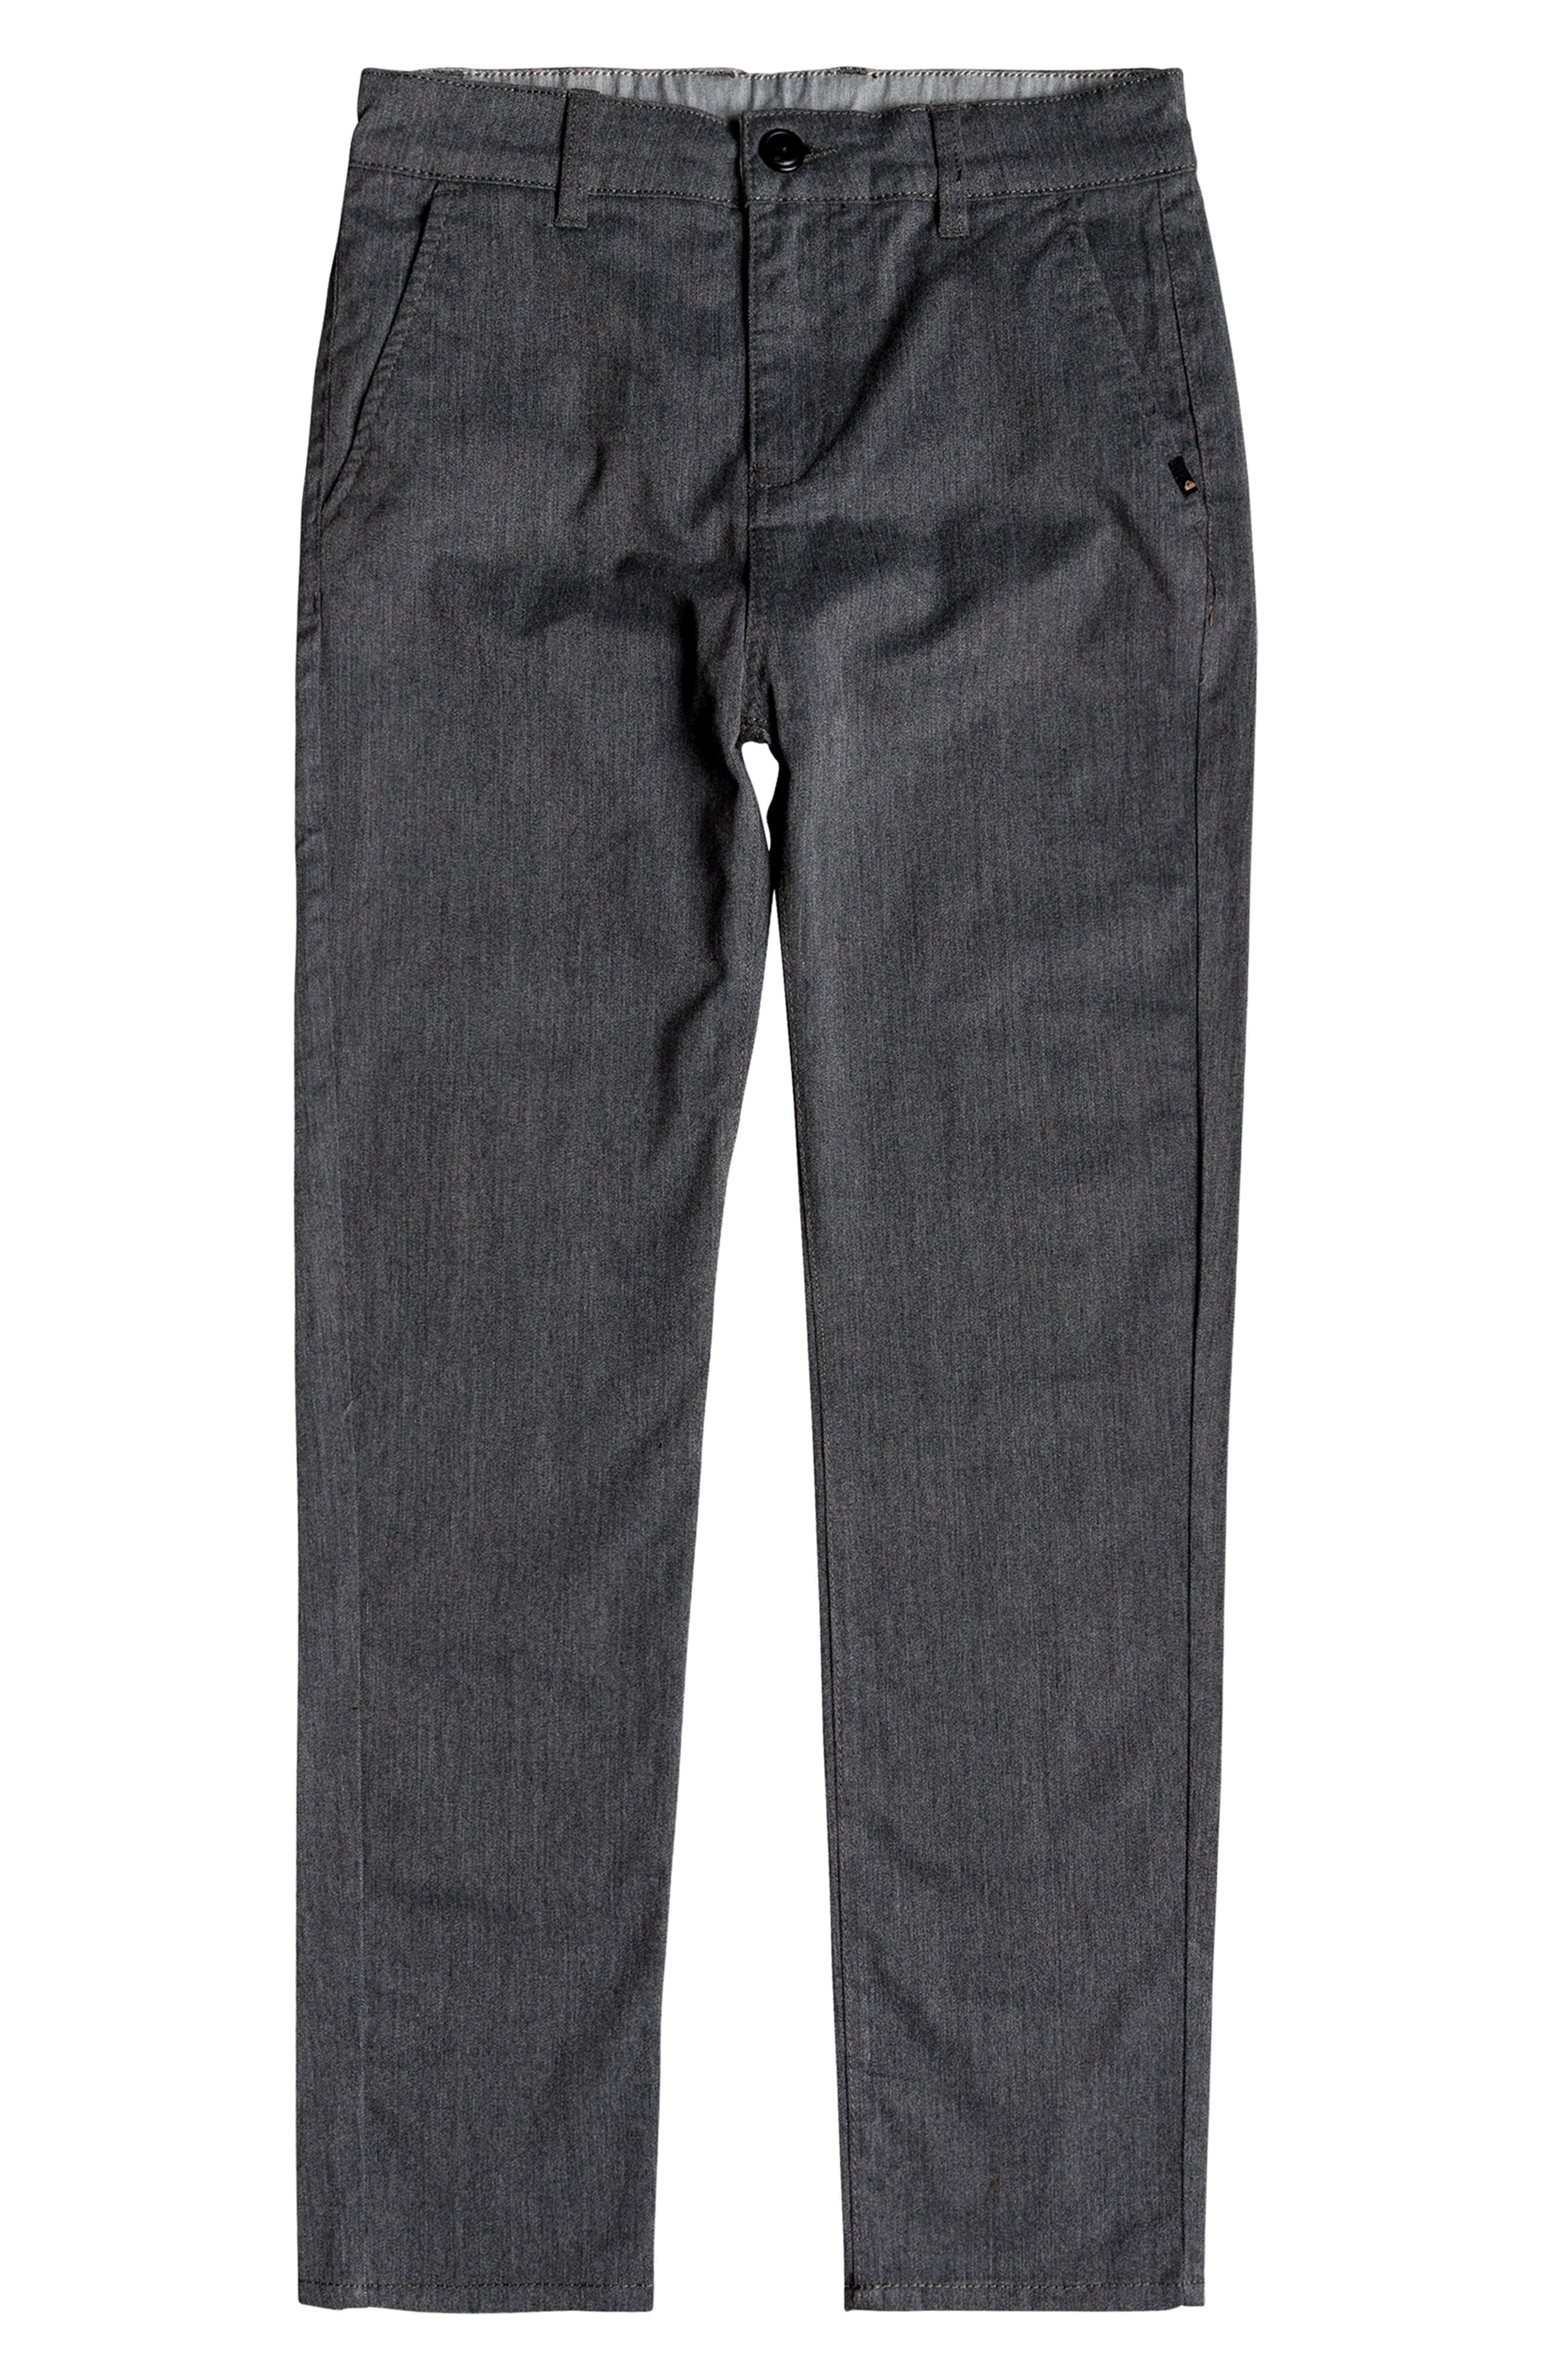 Boys Quiksilver Everyday Union Straight Leg Pants Size 27  Grey